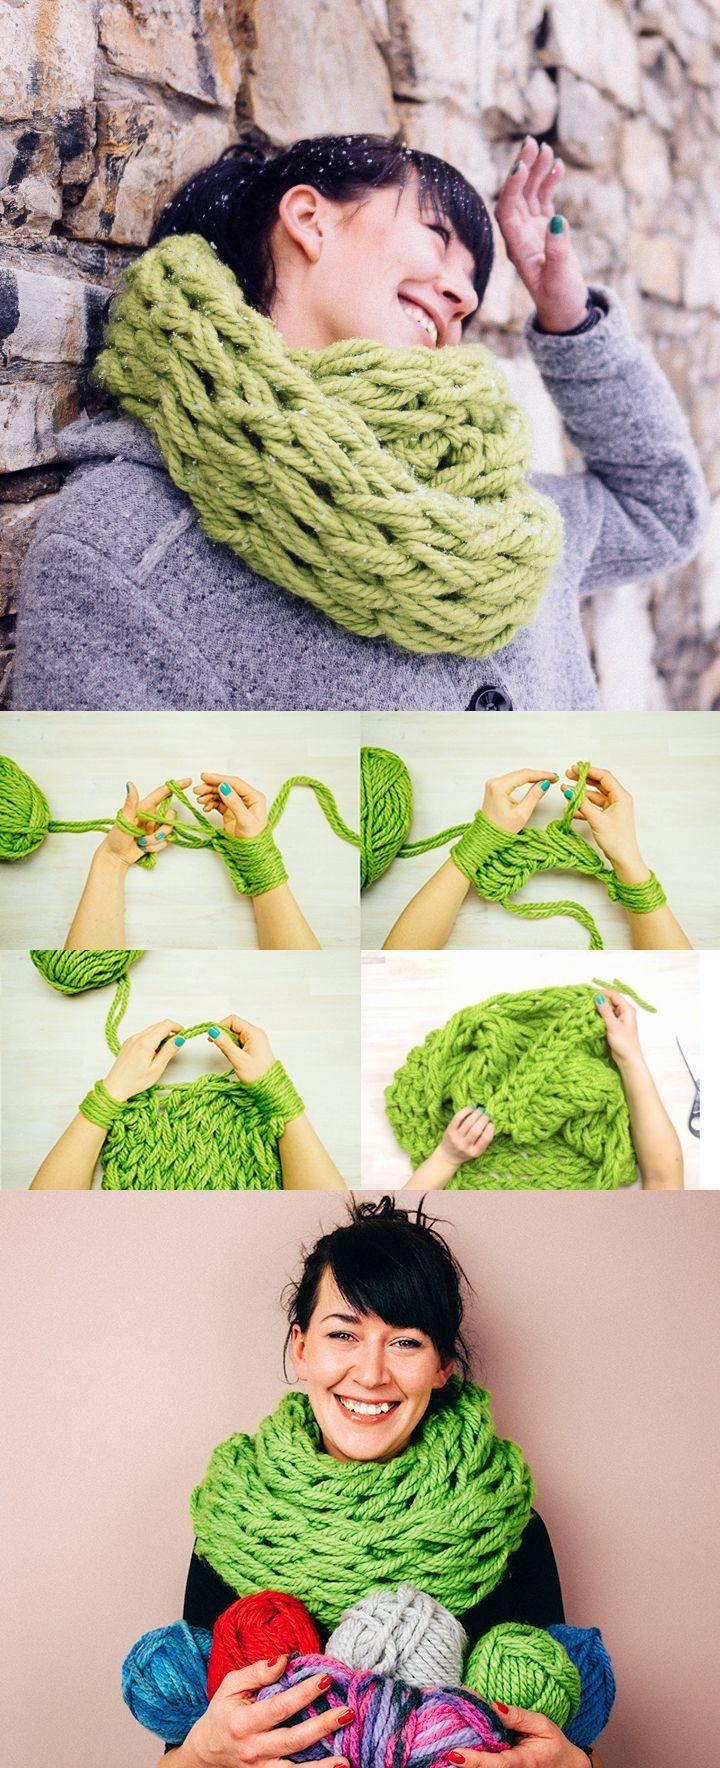 12 Days of DIY Christmas Gifts | pluma | Pinterest | Tejido, Lana y ...